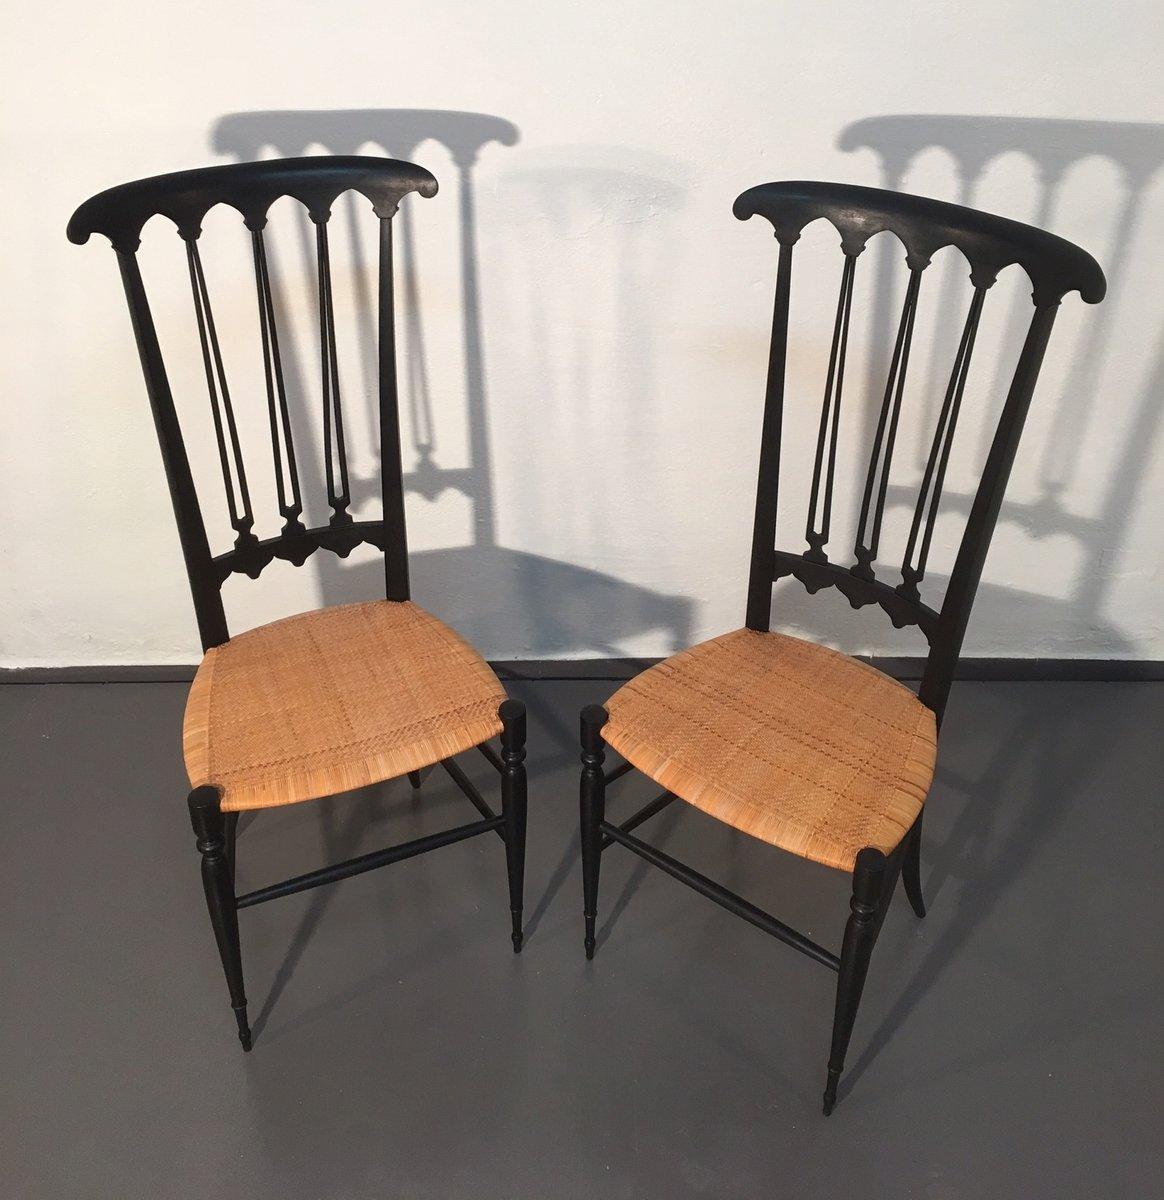 schwarze mid century chiavari st hle 2er set bei pamono kaufen. Black Bedroom Furniture Sets. Home Design Ideas